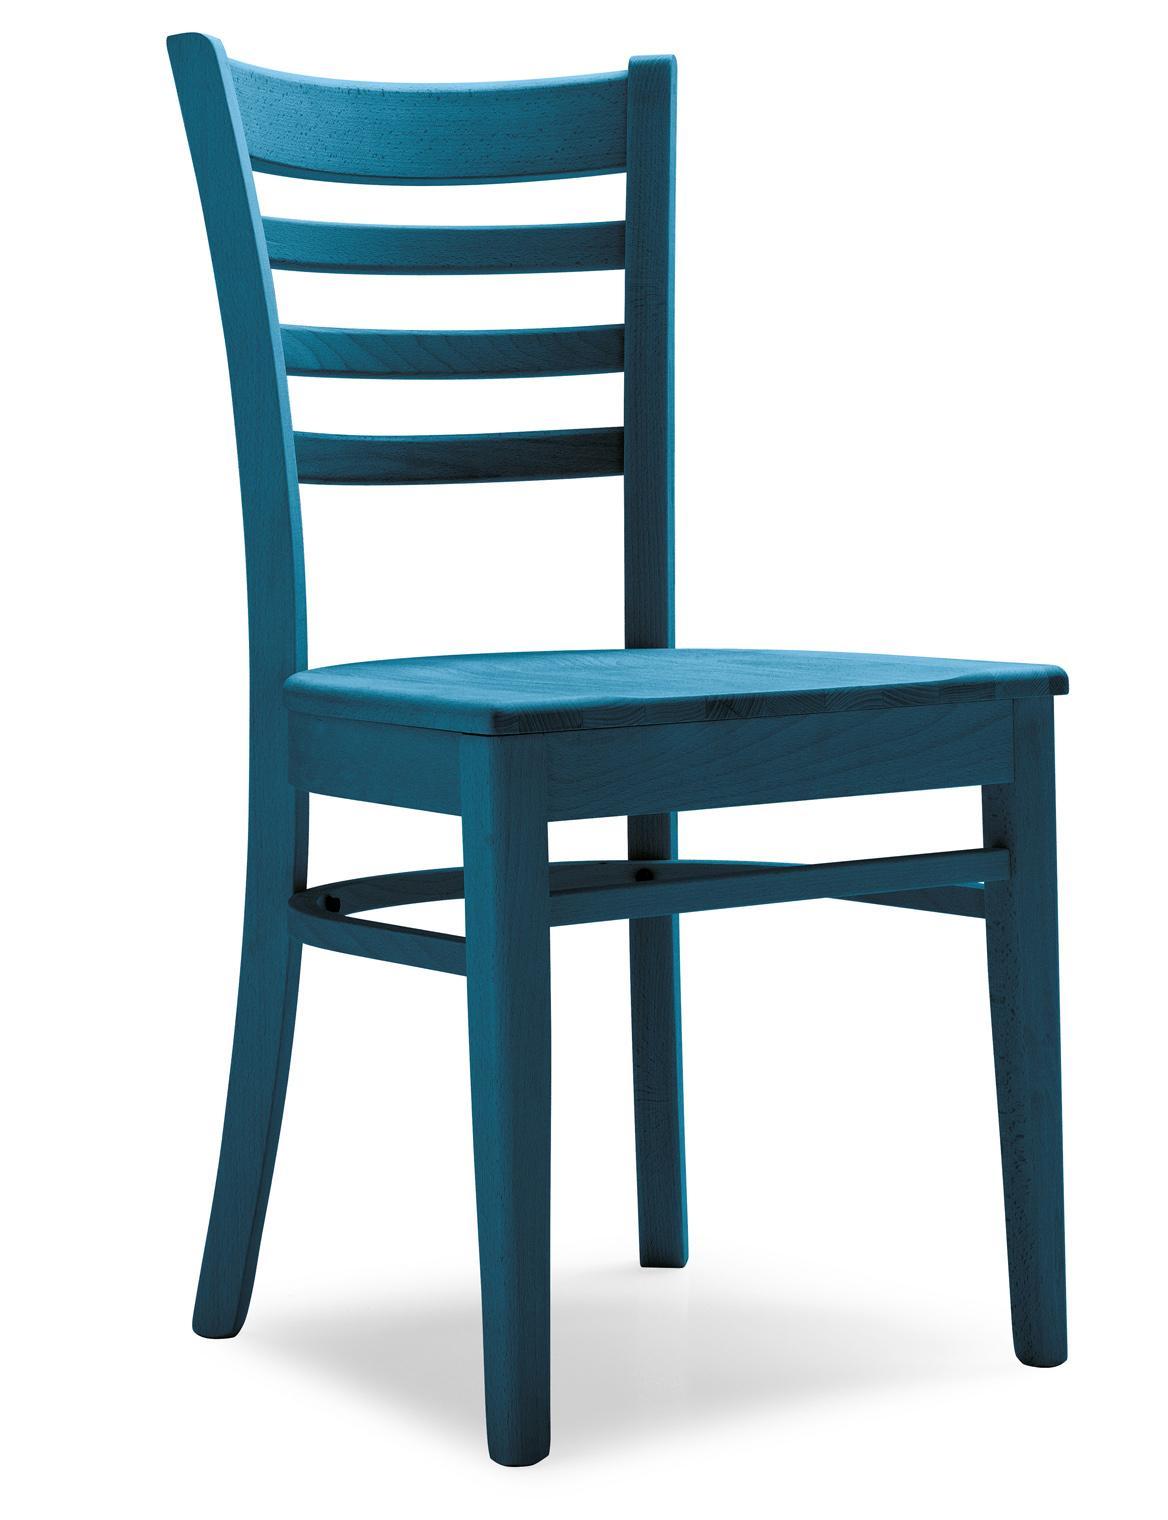 Sedie da ristoranti design 4 0 100000 0 pezzi - Sedie in legno design ...